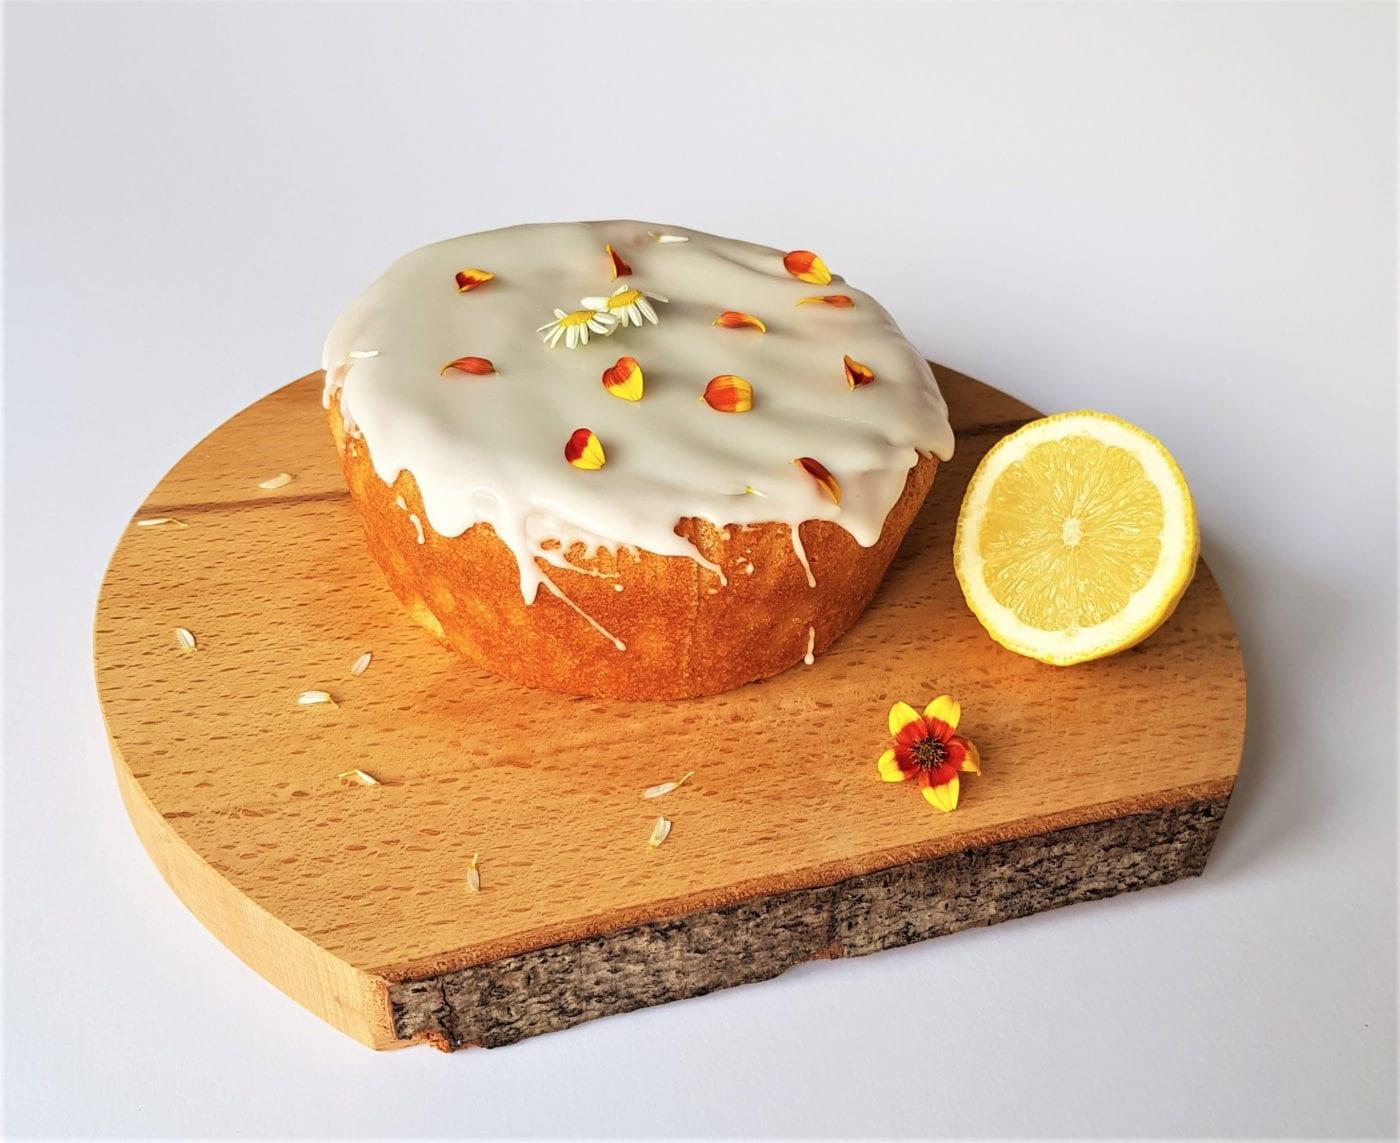 Vegan Lemon and Coconut Drizzle Cake